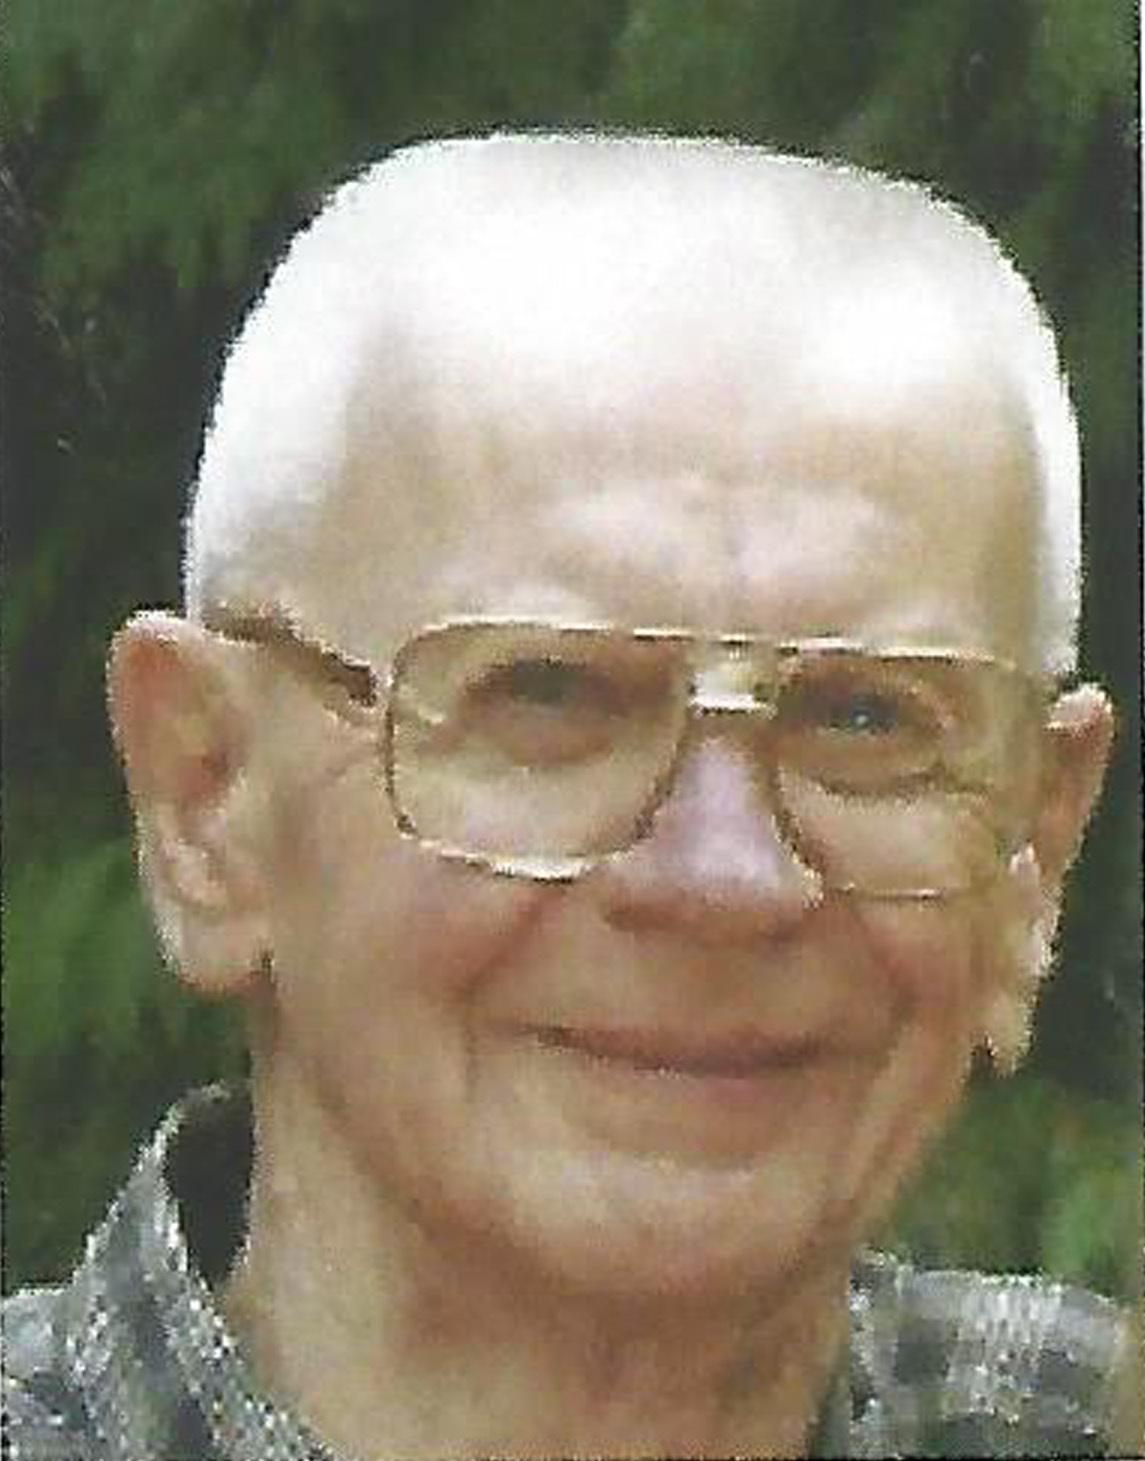 Roger Axel Farden